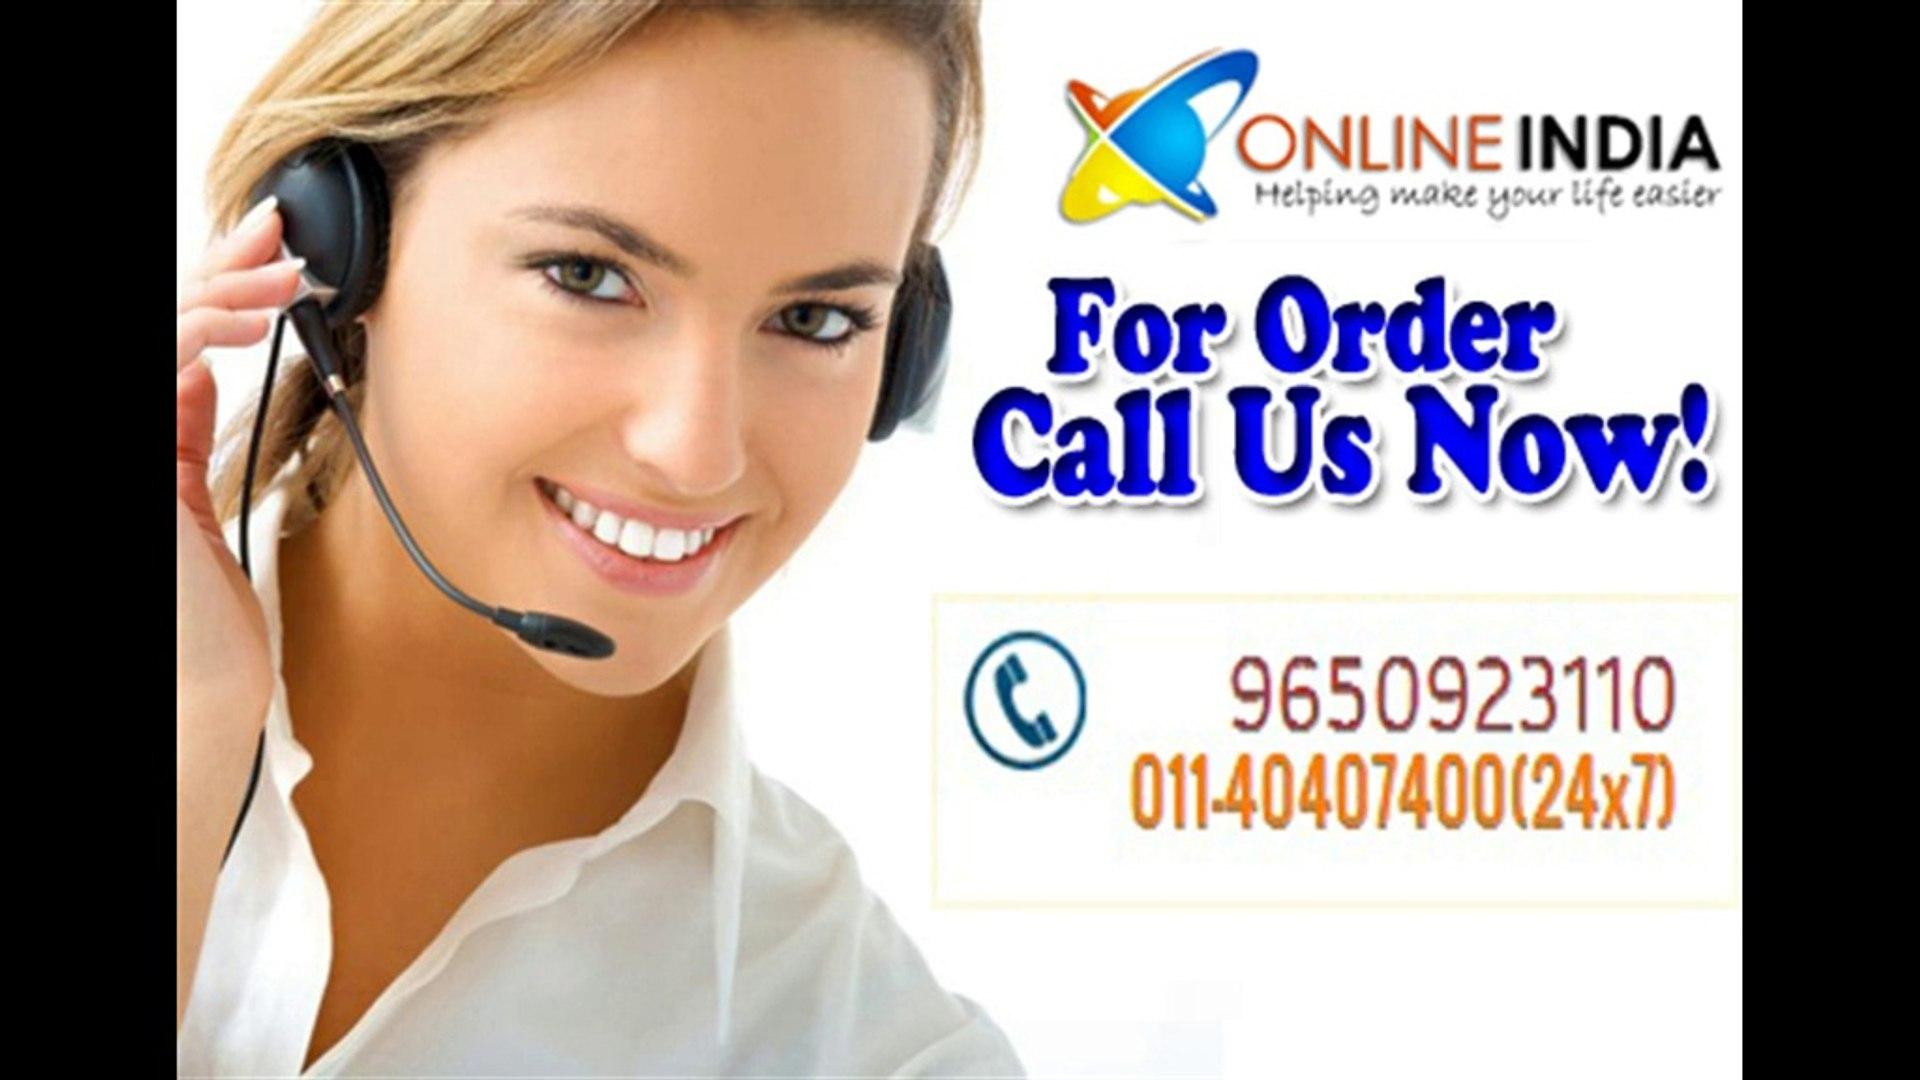 SPY MOBILE SOFTWARE , SPY MOBILE PHONE SOFTWARE , 09650923110 , www.softwaresonline.net